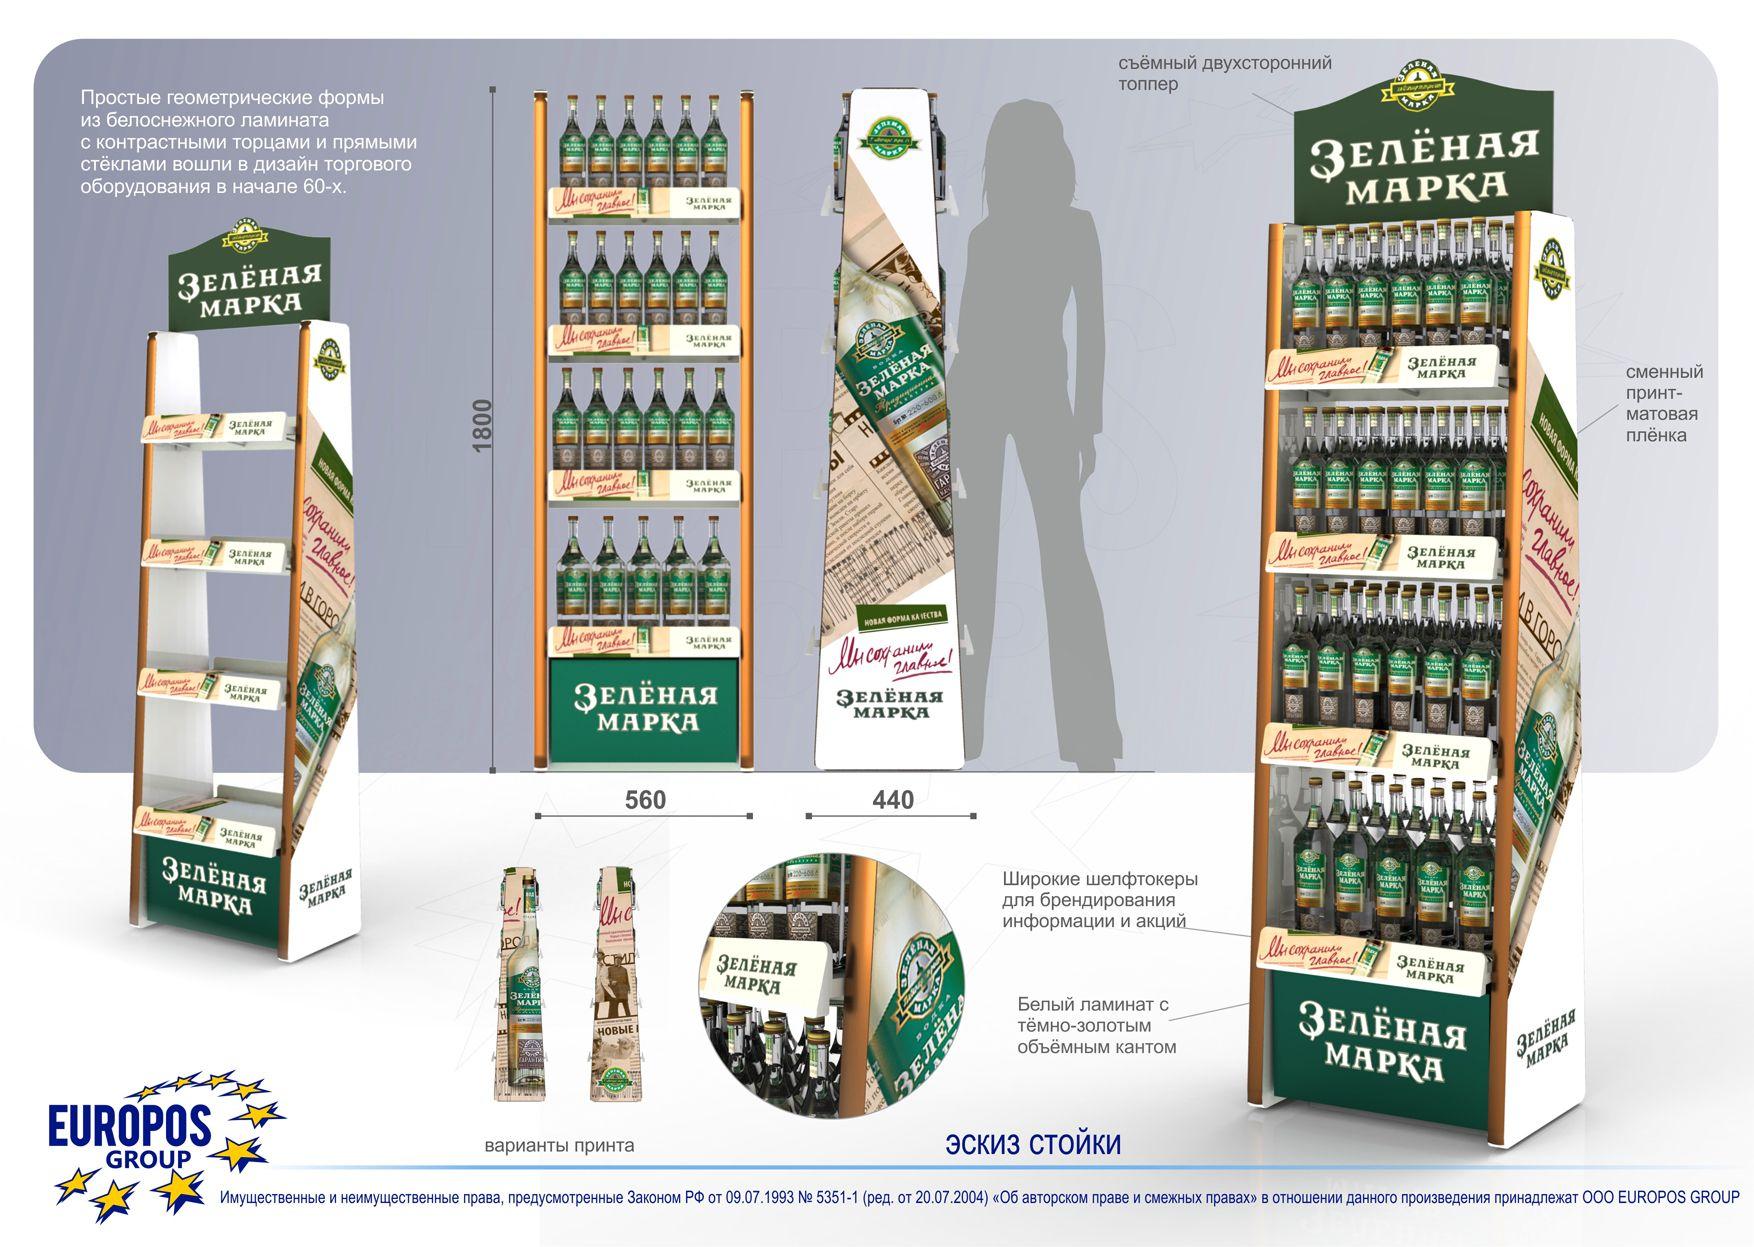 Posm design sofy posm design - Retail Point Of Purchase Design Pop Design Alcohol Soft Drinks Pop Www Pos